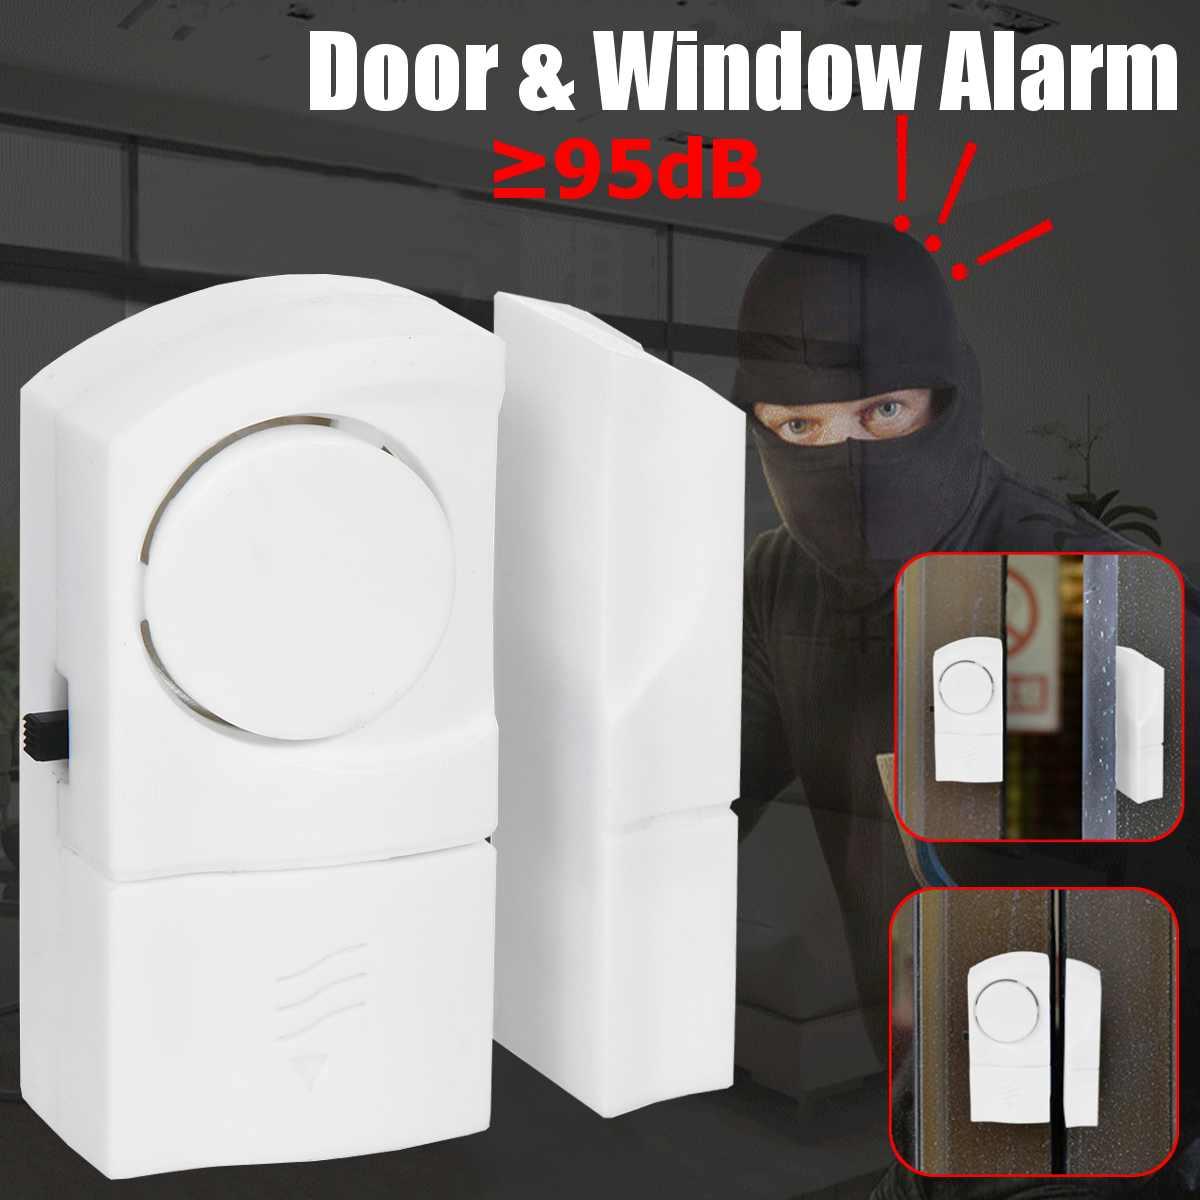 10Pcs 90dB Safety Alarm System Standalone Magnetic Sensors Wireless Home Door Window Entry Burglar Alarm Security Alarm